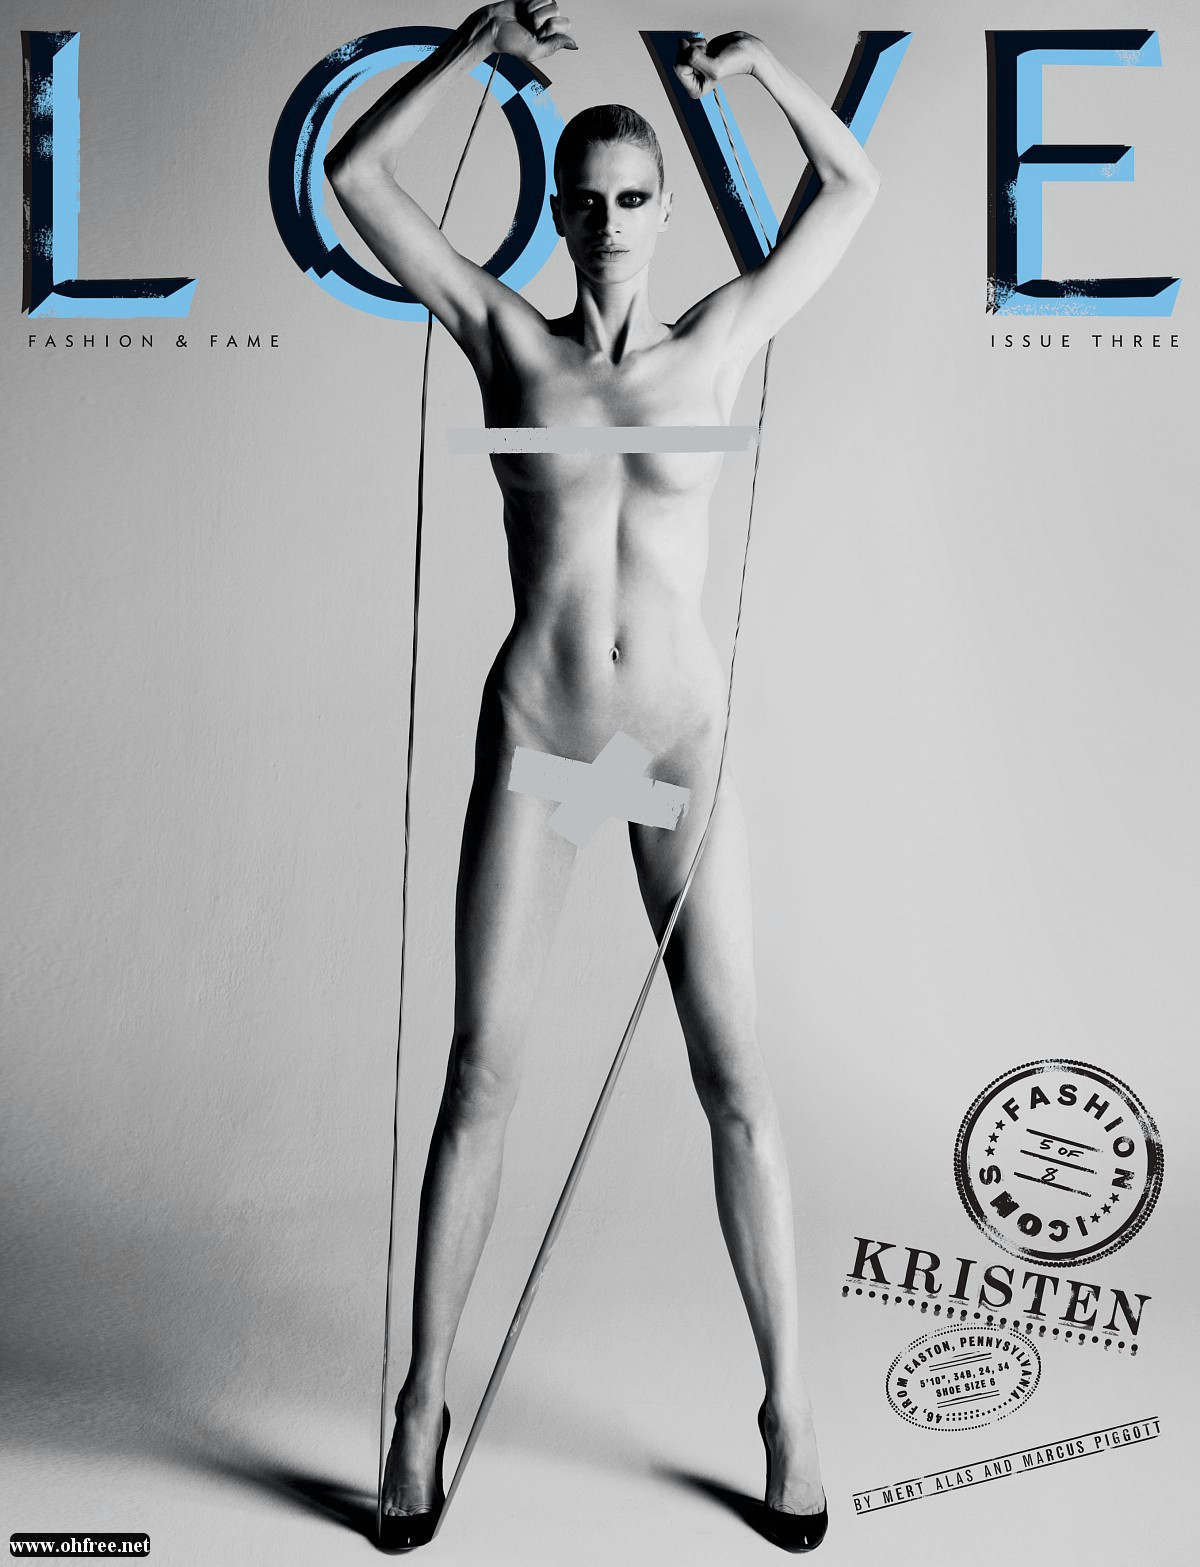 http://4.bp.blogspot.com/_B53qpvgksMA/TVRjtNZNMnI/AAAAAAAAEpA/UpITkvbLhq4/s1600/love-kristen-mcmenamy-nude-00.jpg